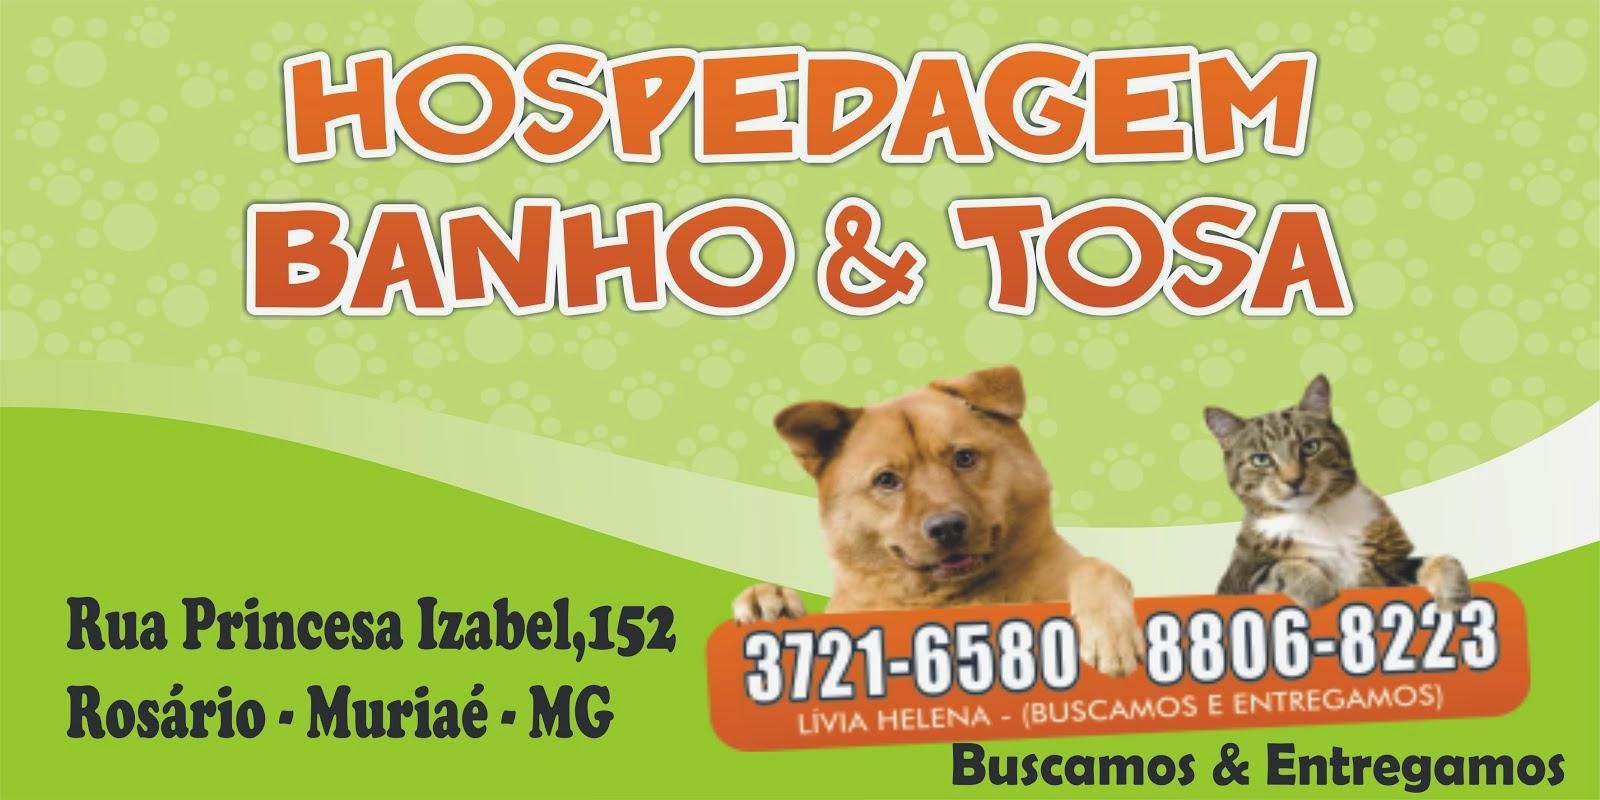 BANHO & TOSA